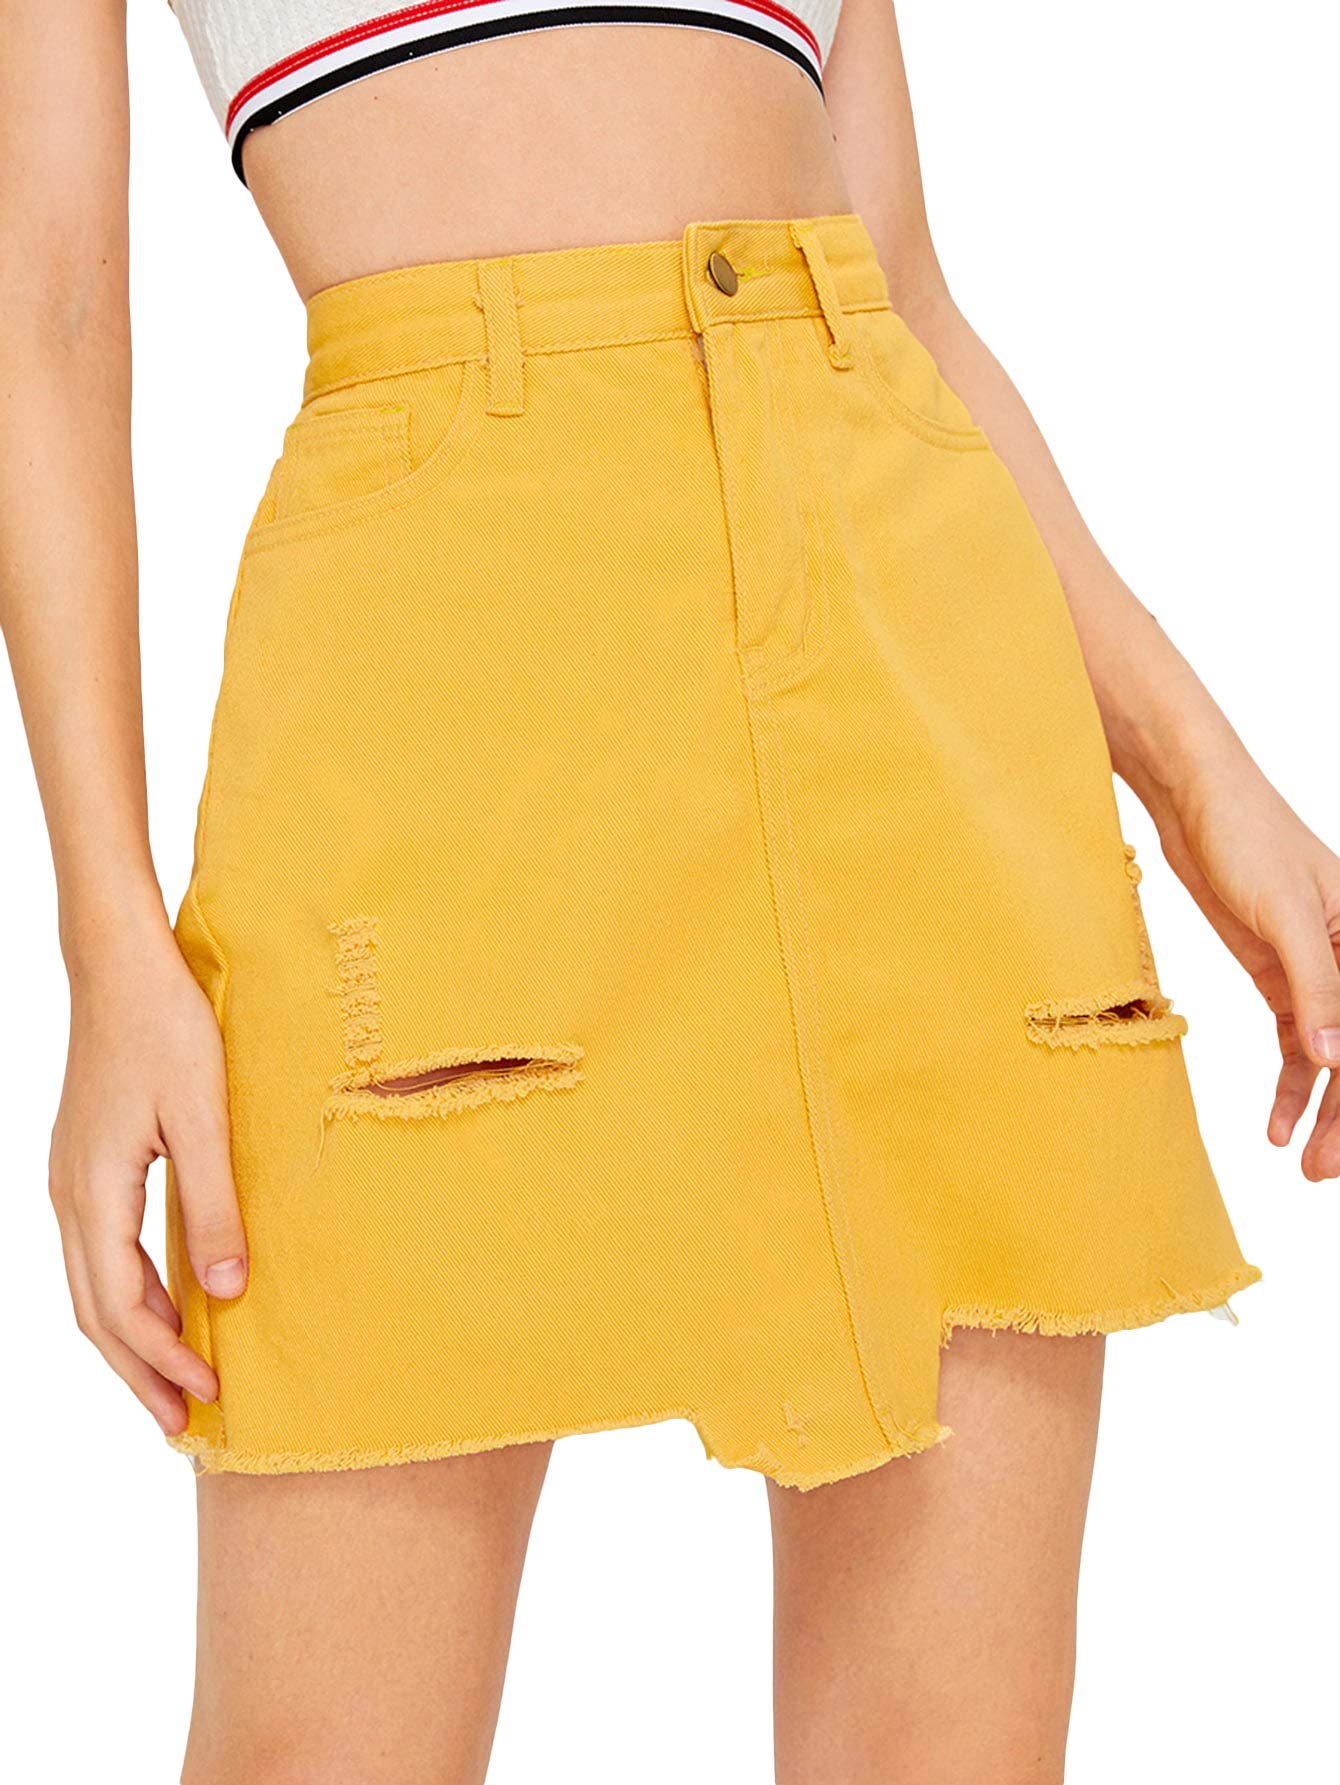 Verdusa Women's Casual Distressed Frayed Pencil Short Denim Skirt Ginger S